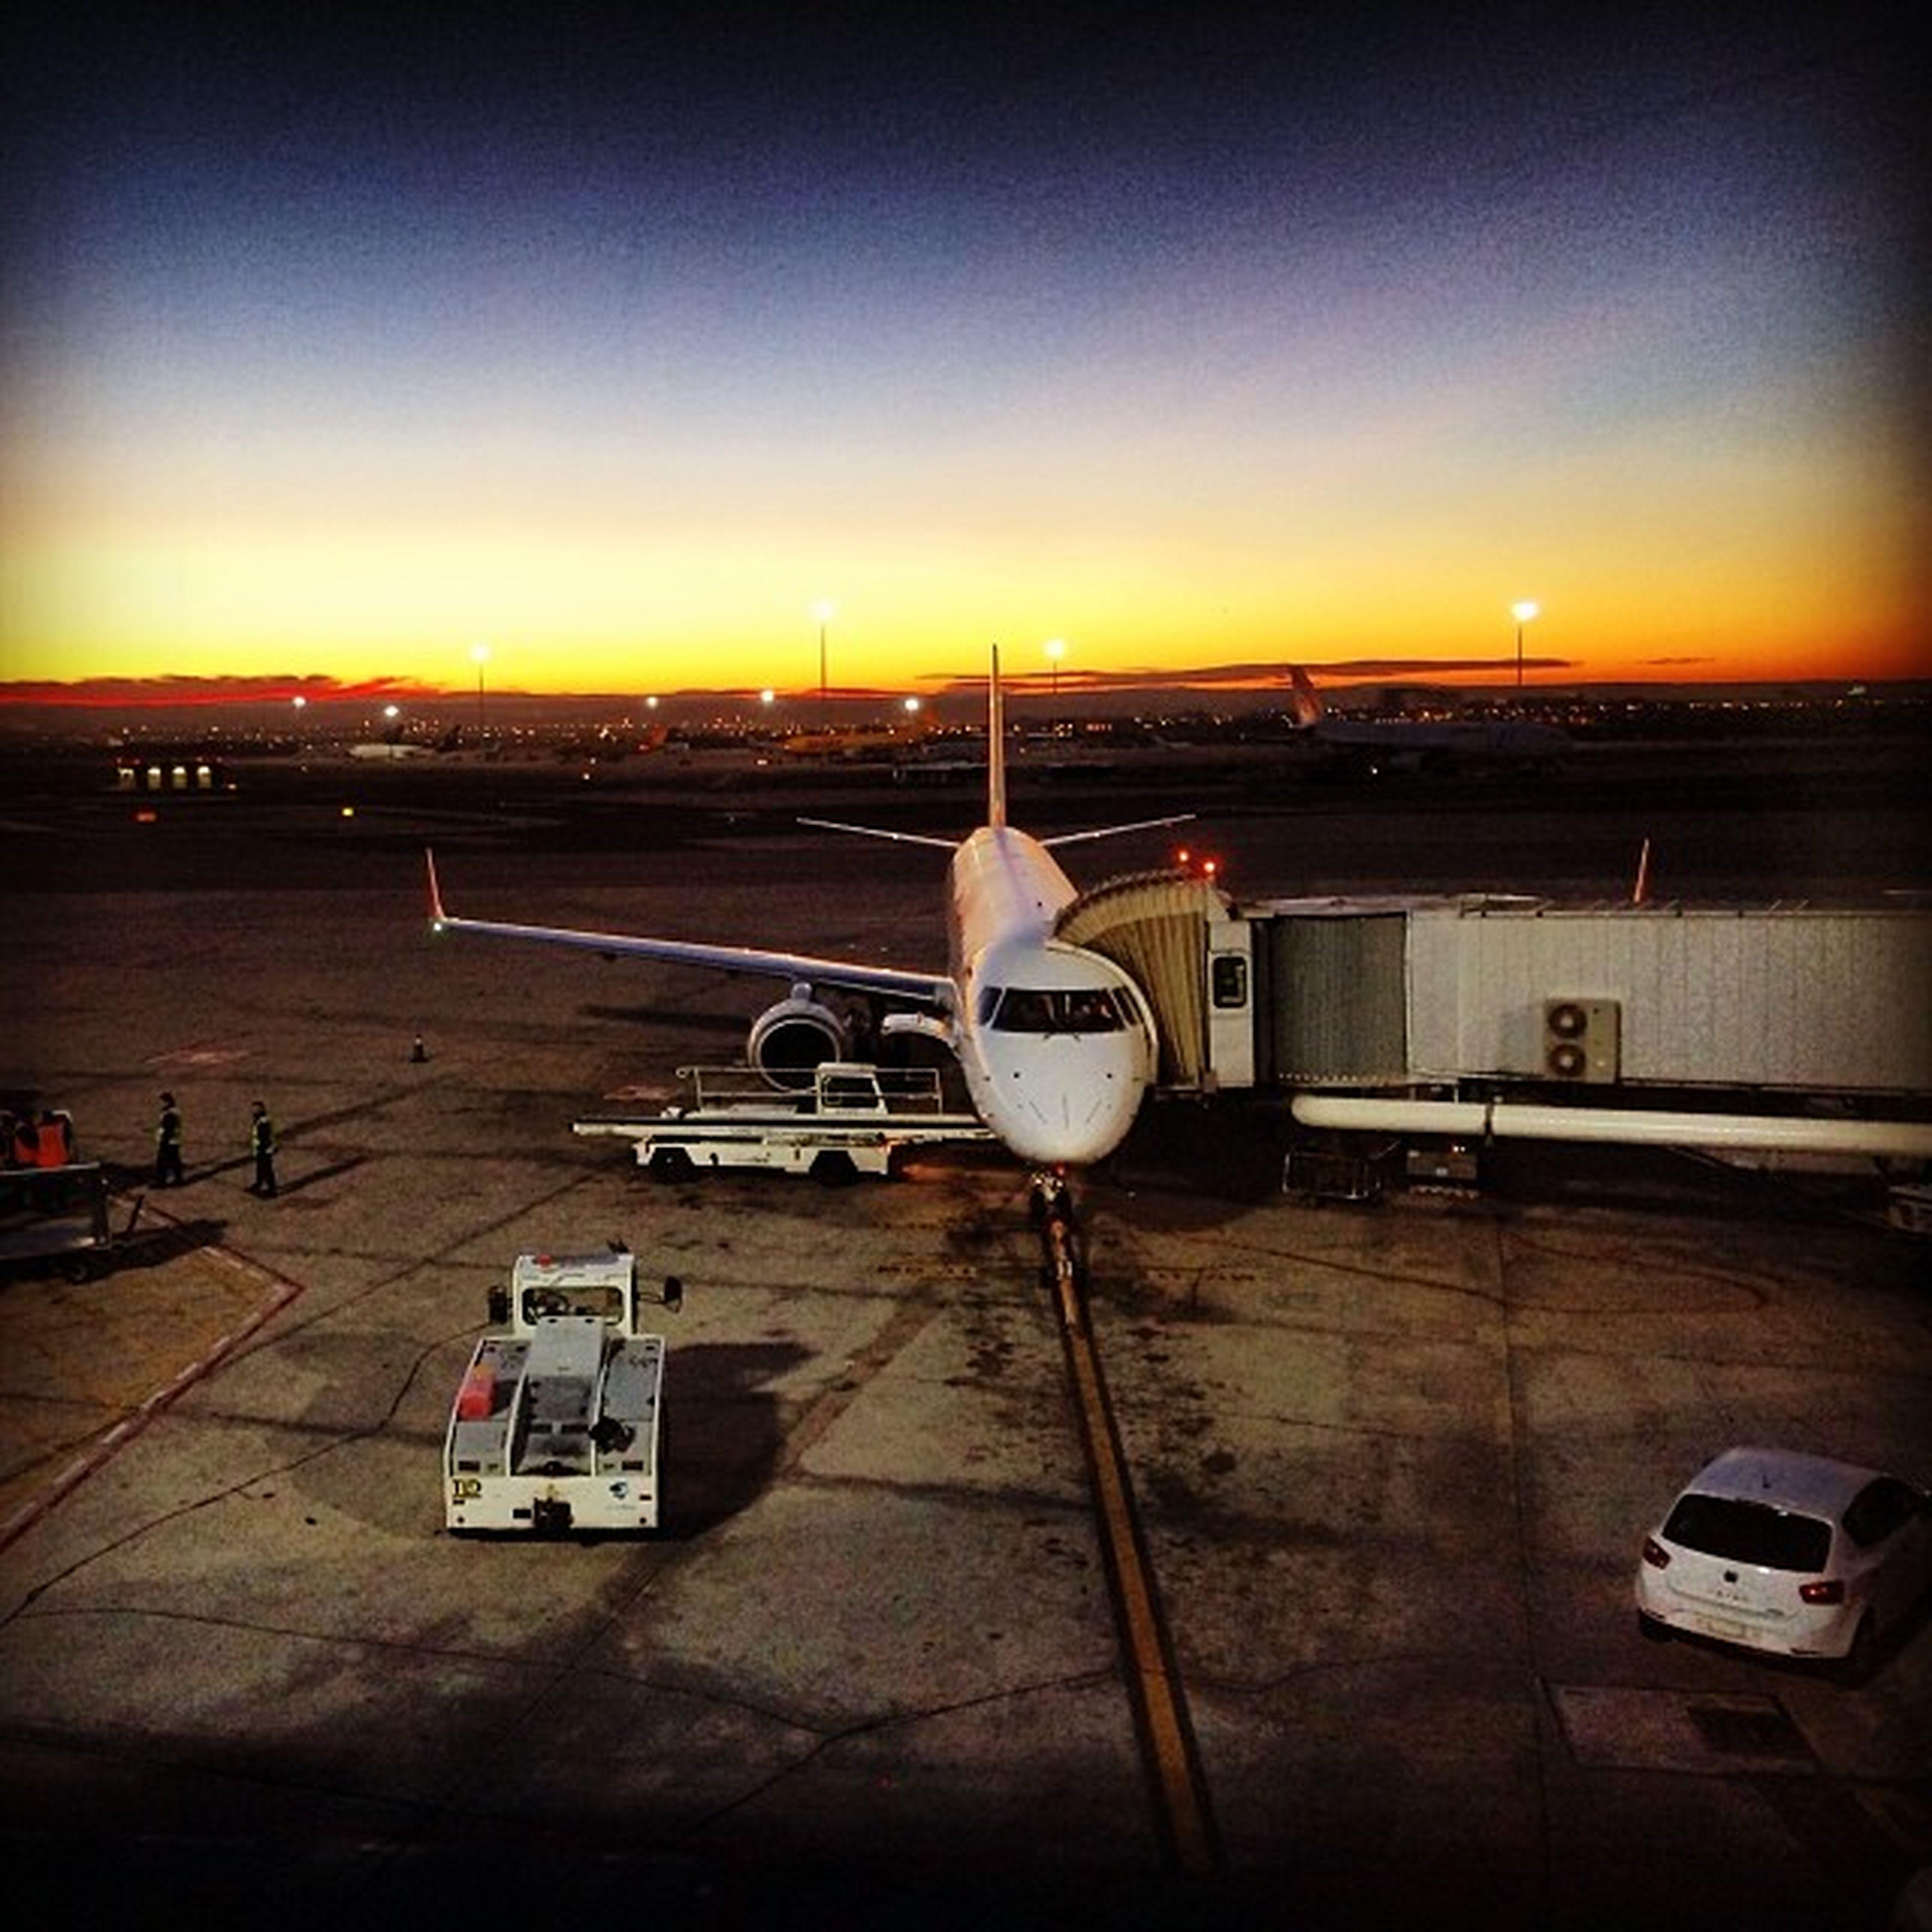 sunset, transportation, mode of transport, orange color, sun, sky, copy space, airplane, nautical vessel, clear sky, travel, sea, car, land vehicle, air vehicle, airport, outdoors, public transportation, sunlight, journey